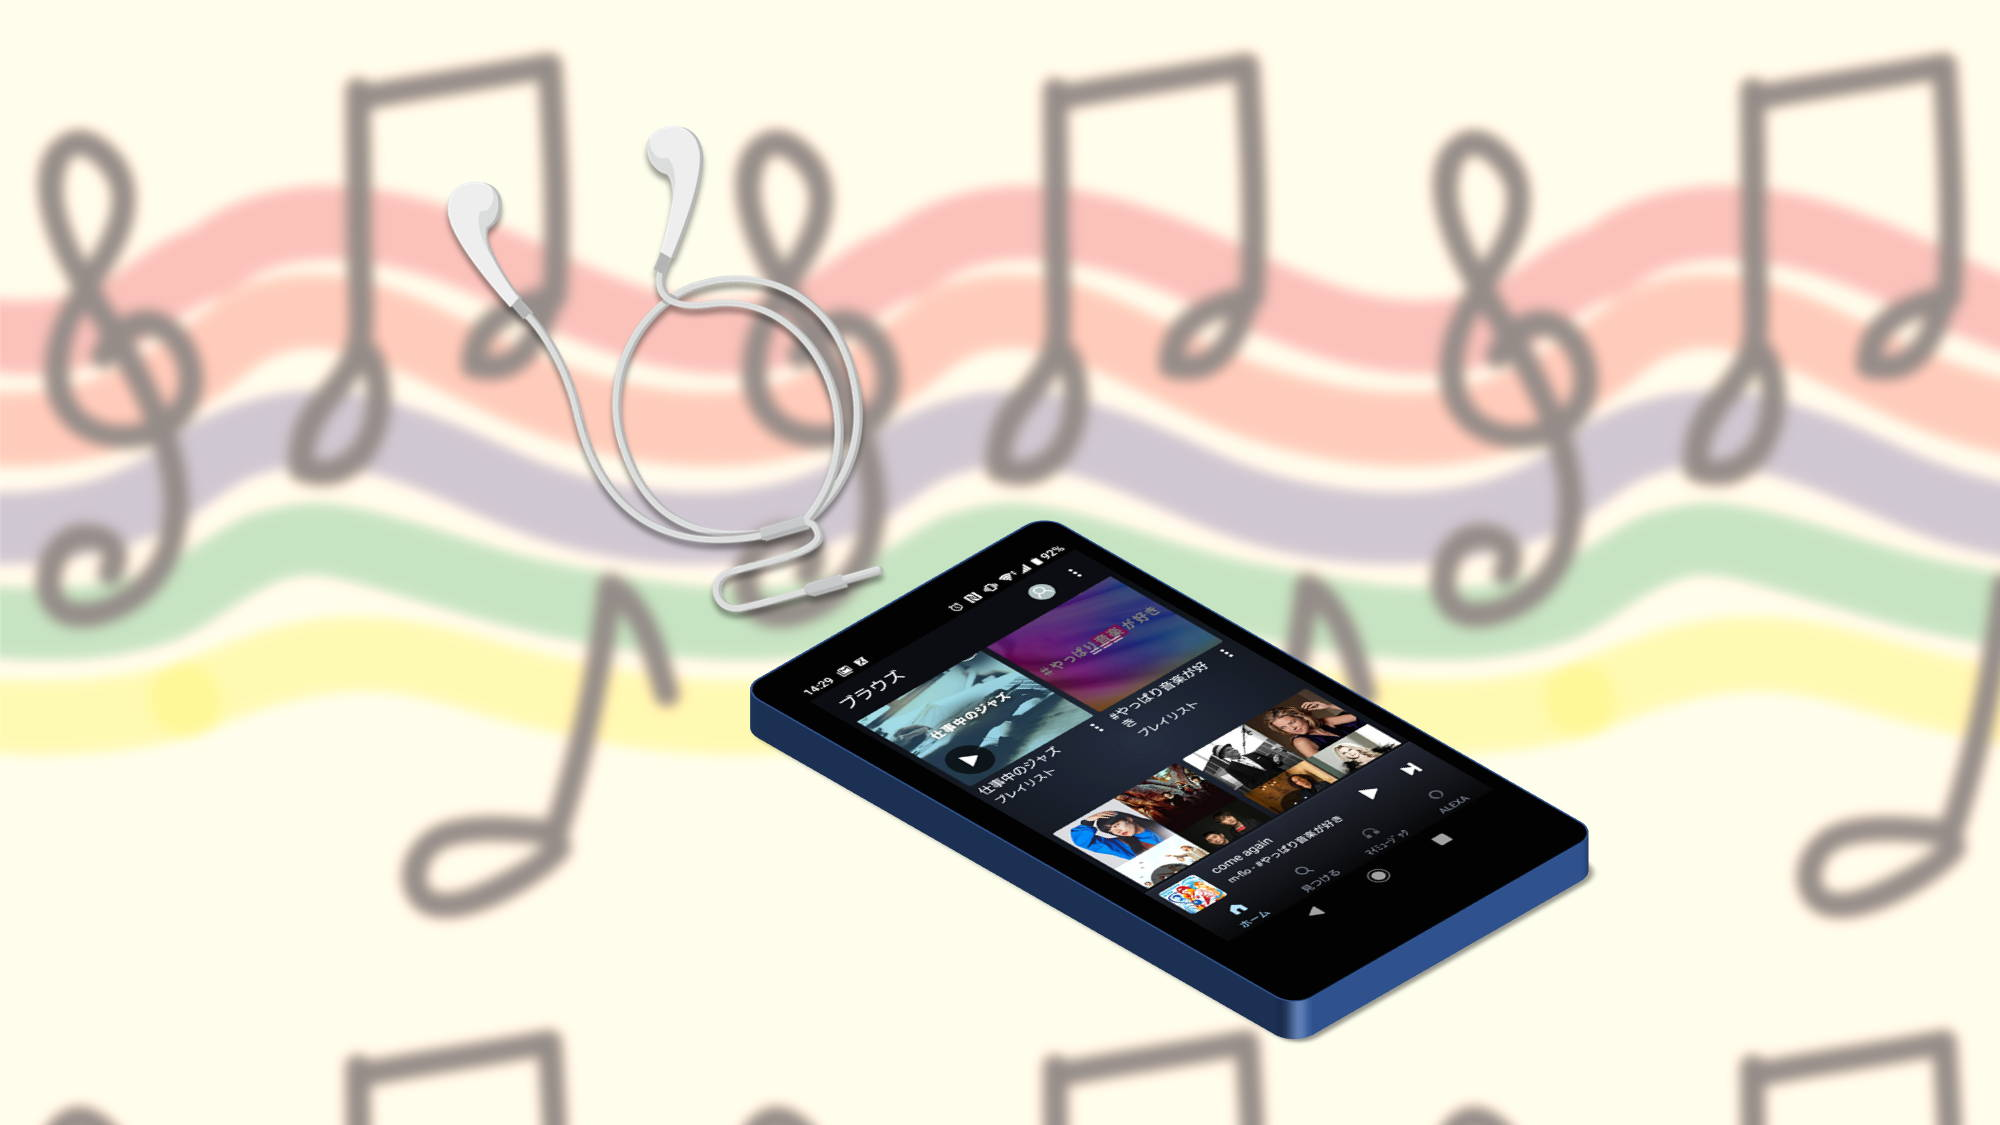 Amazon Musicのアプリを開いたスマホとイヤホン